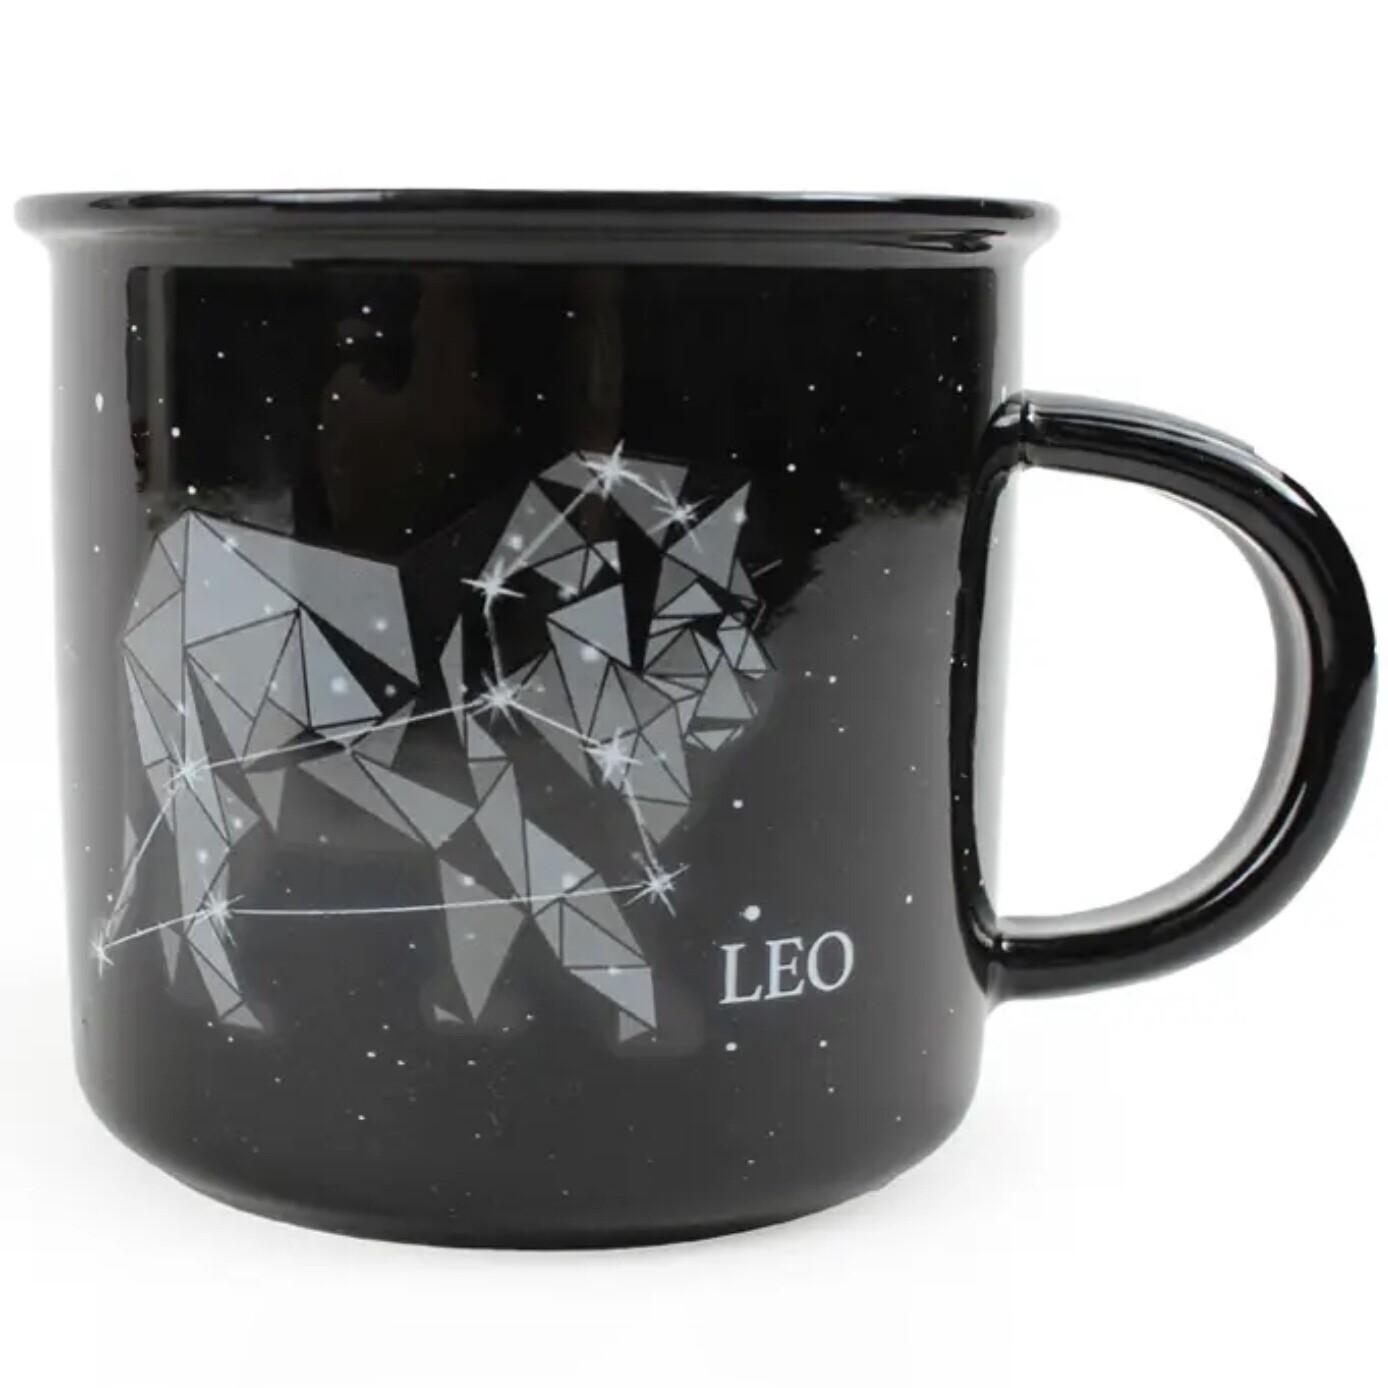 Leo Constellation Ceramic Camp Mug